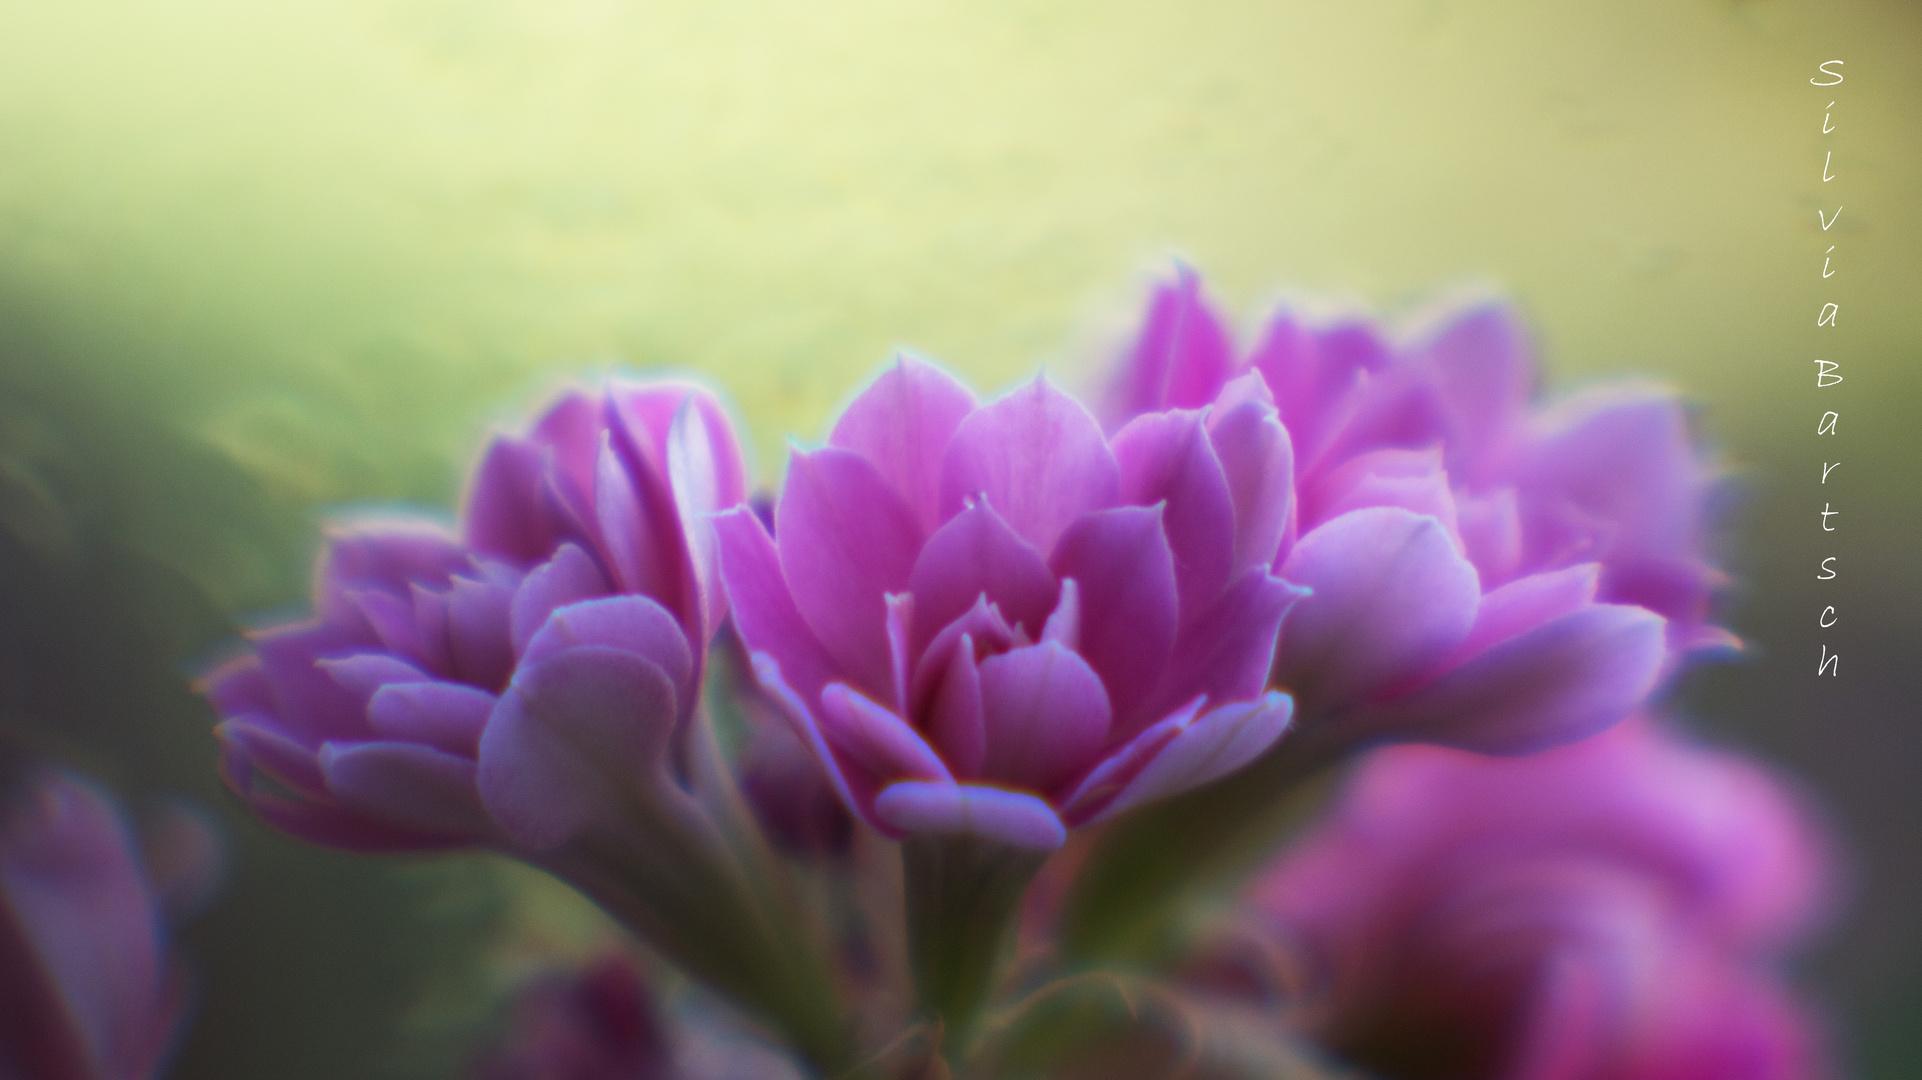 Ein zarter Blütenkuss